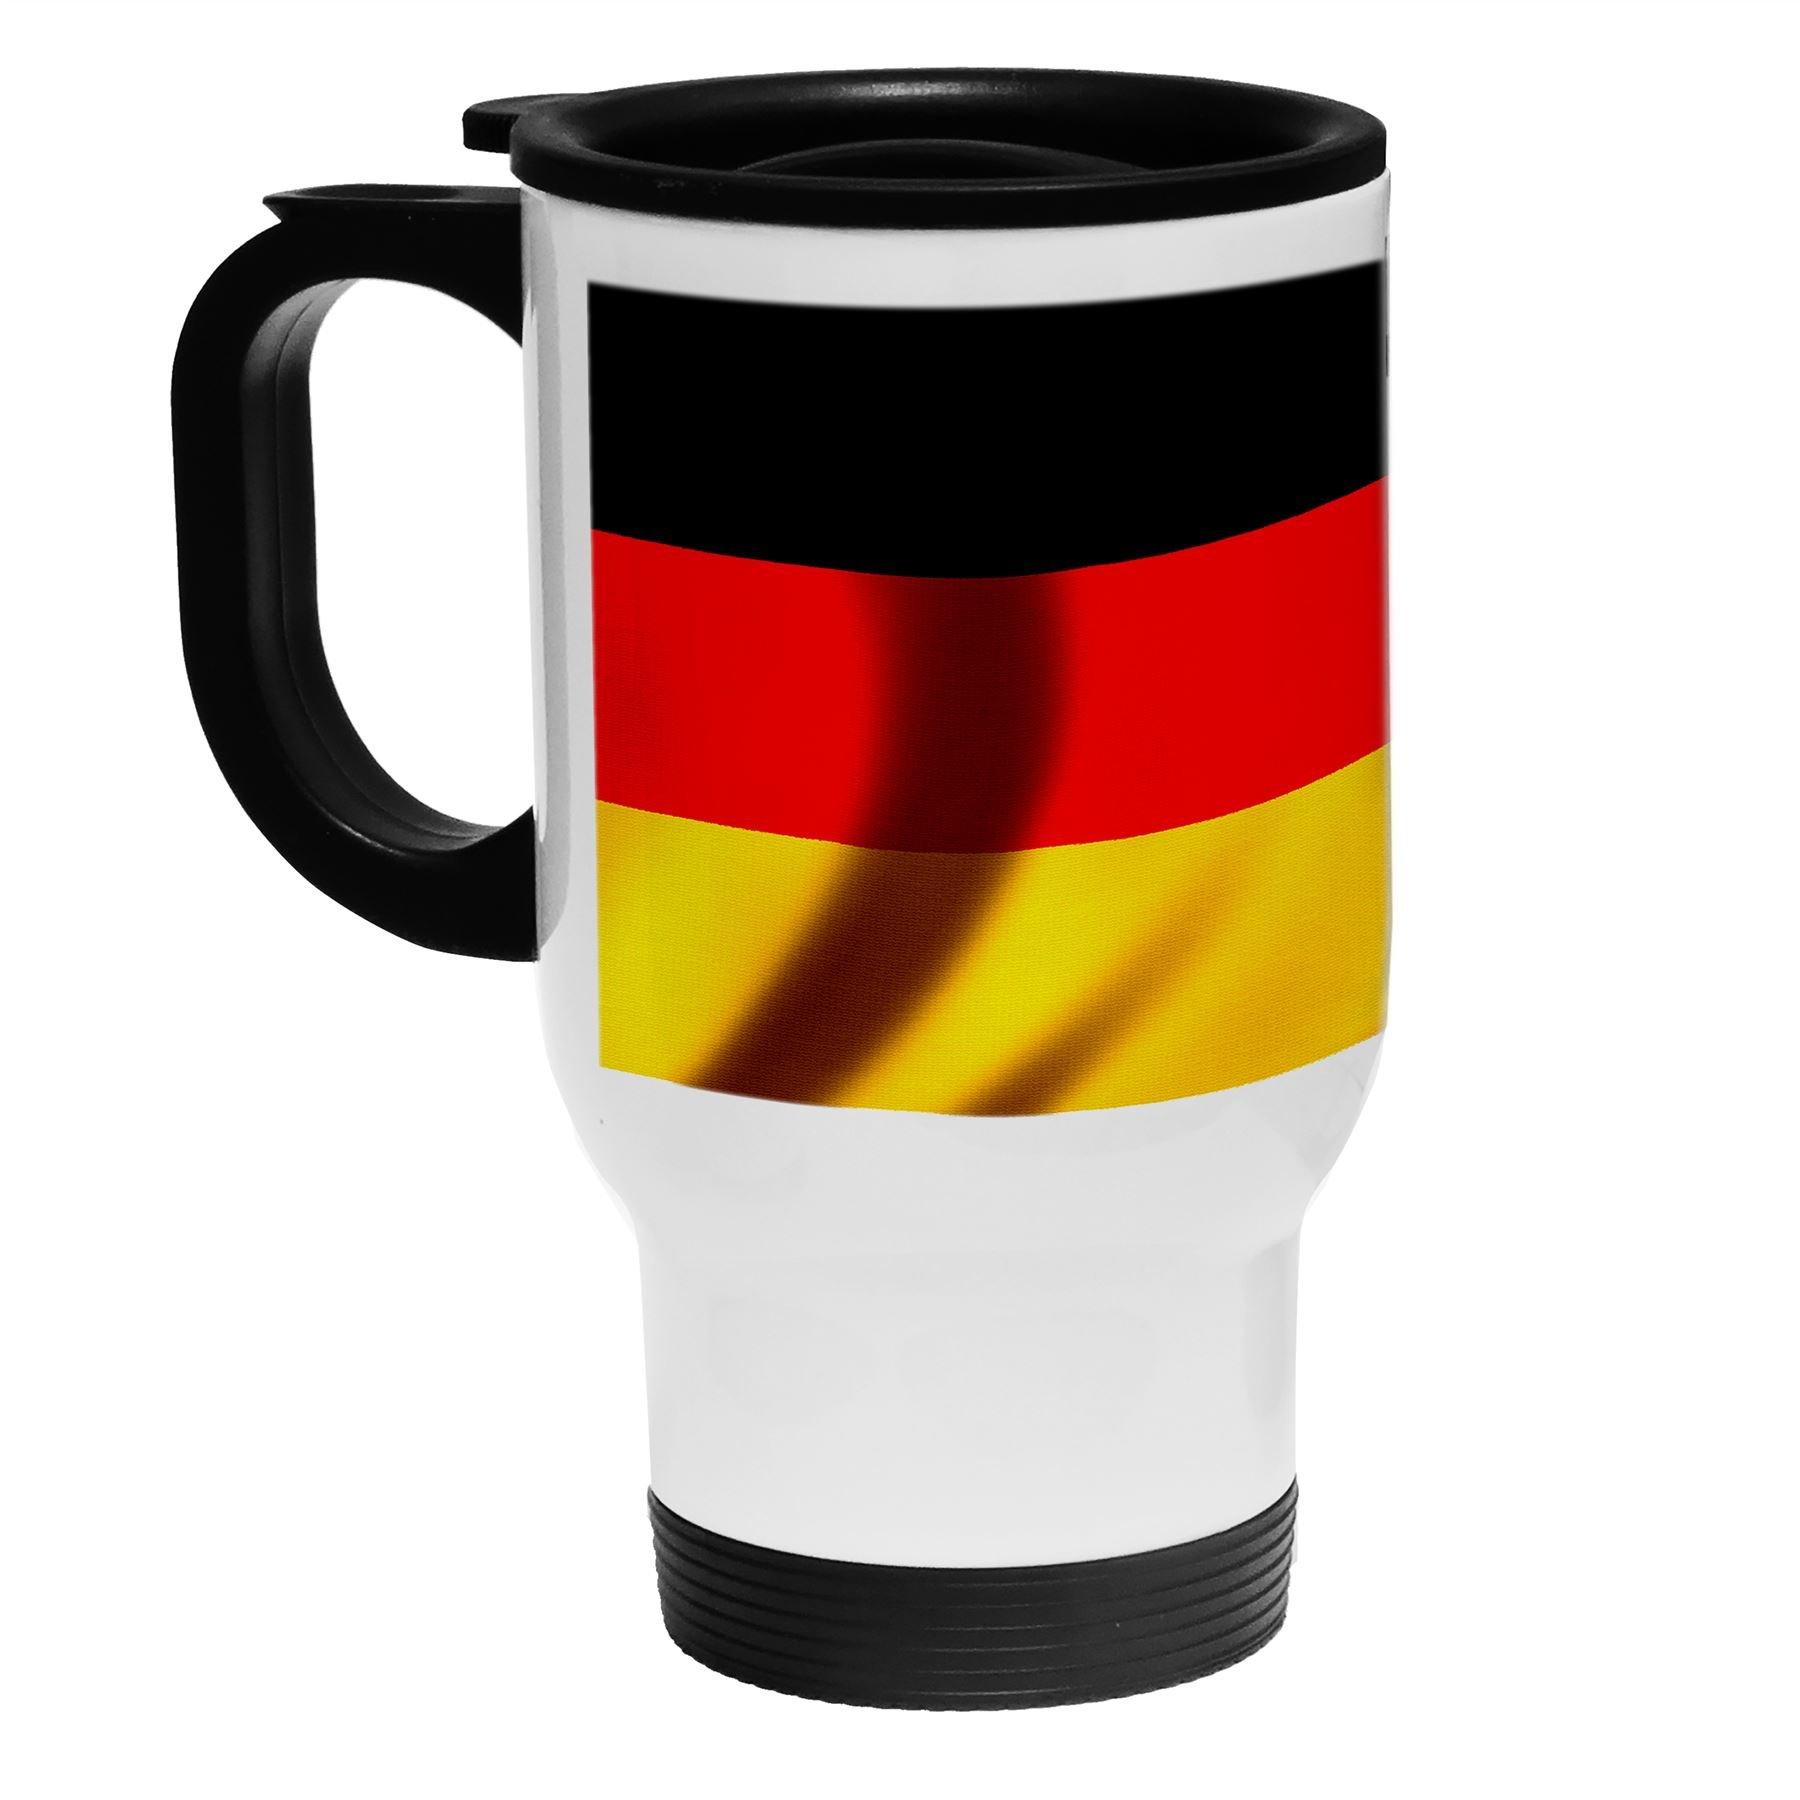 White Stainless Steel Coffee / Travel Mug - Flag of Germany (German) - Wood